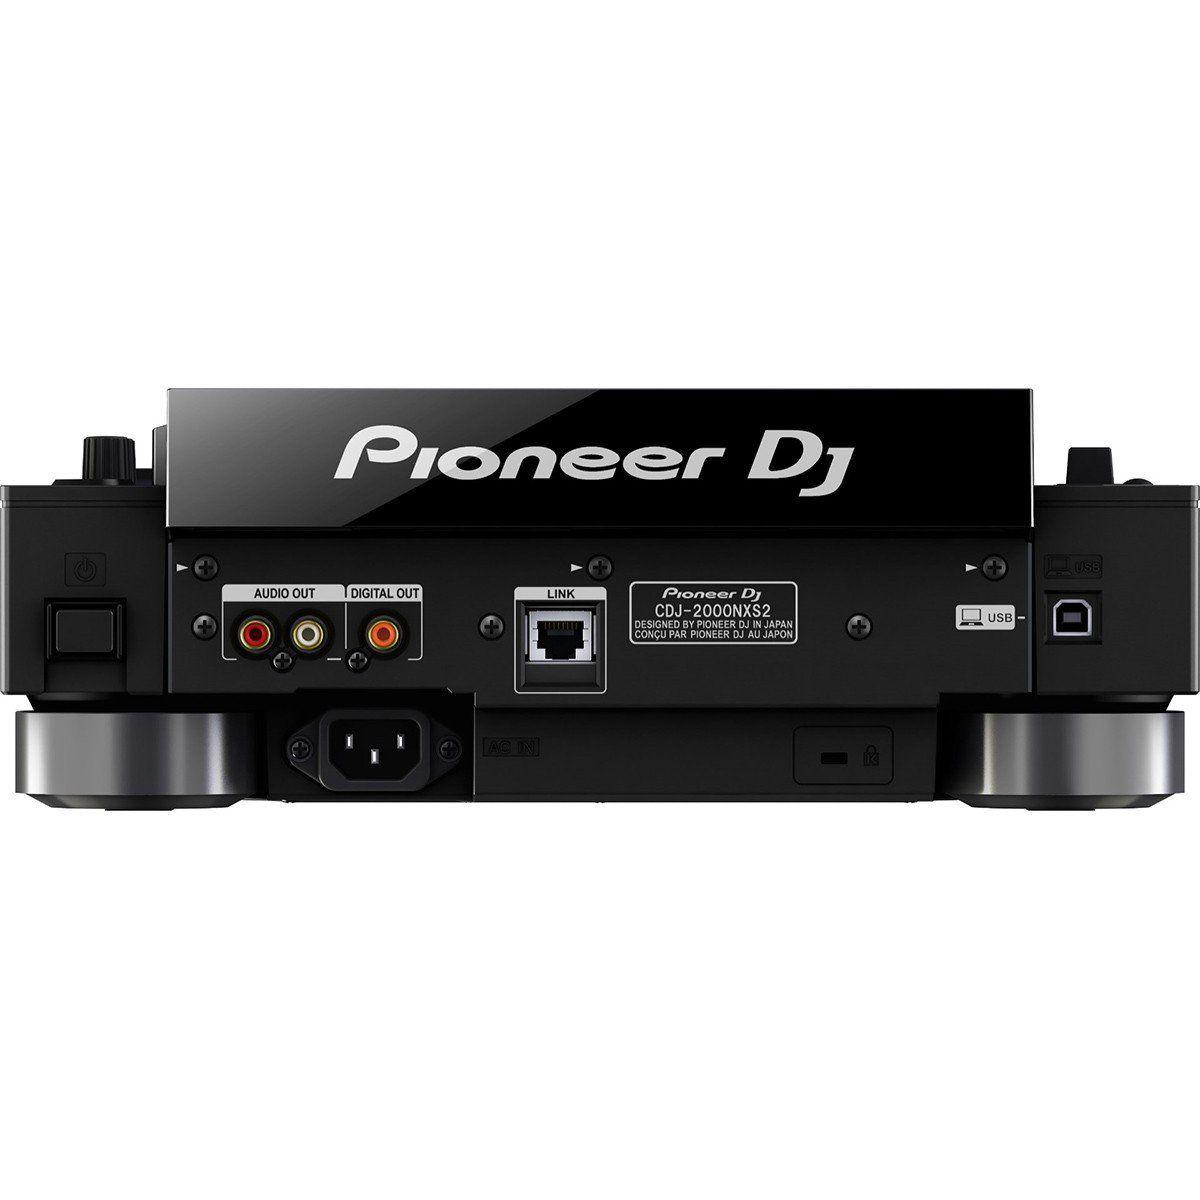 Pioneer CDJ-2000 Nexus 2 Player BiVoltPioneer CDJ2000 Nexus 2 CDJ Profissional